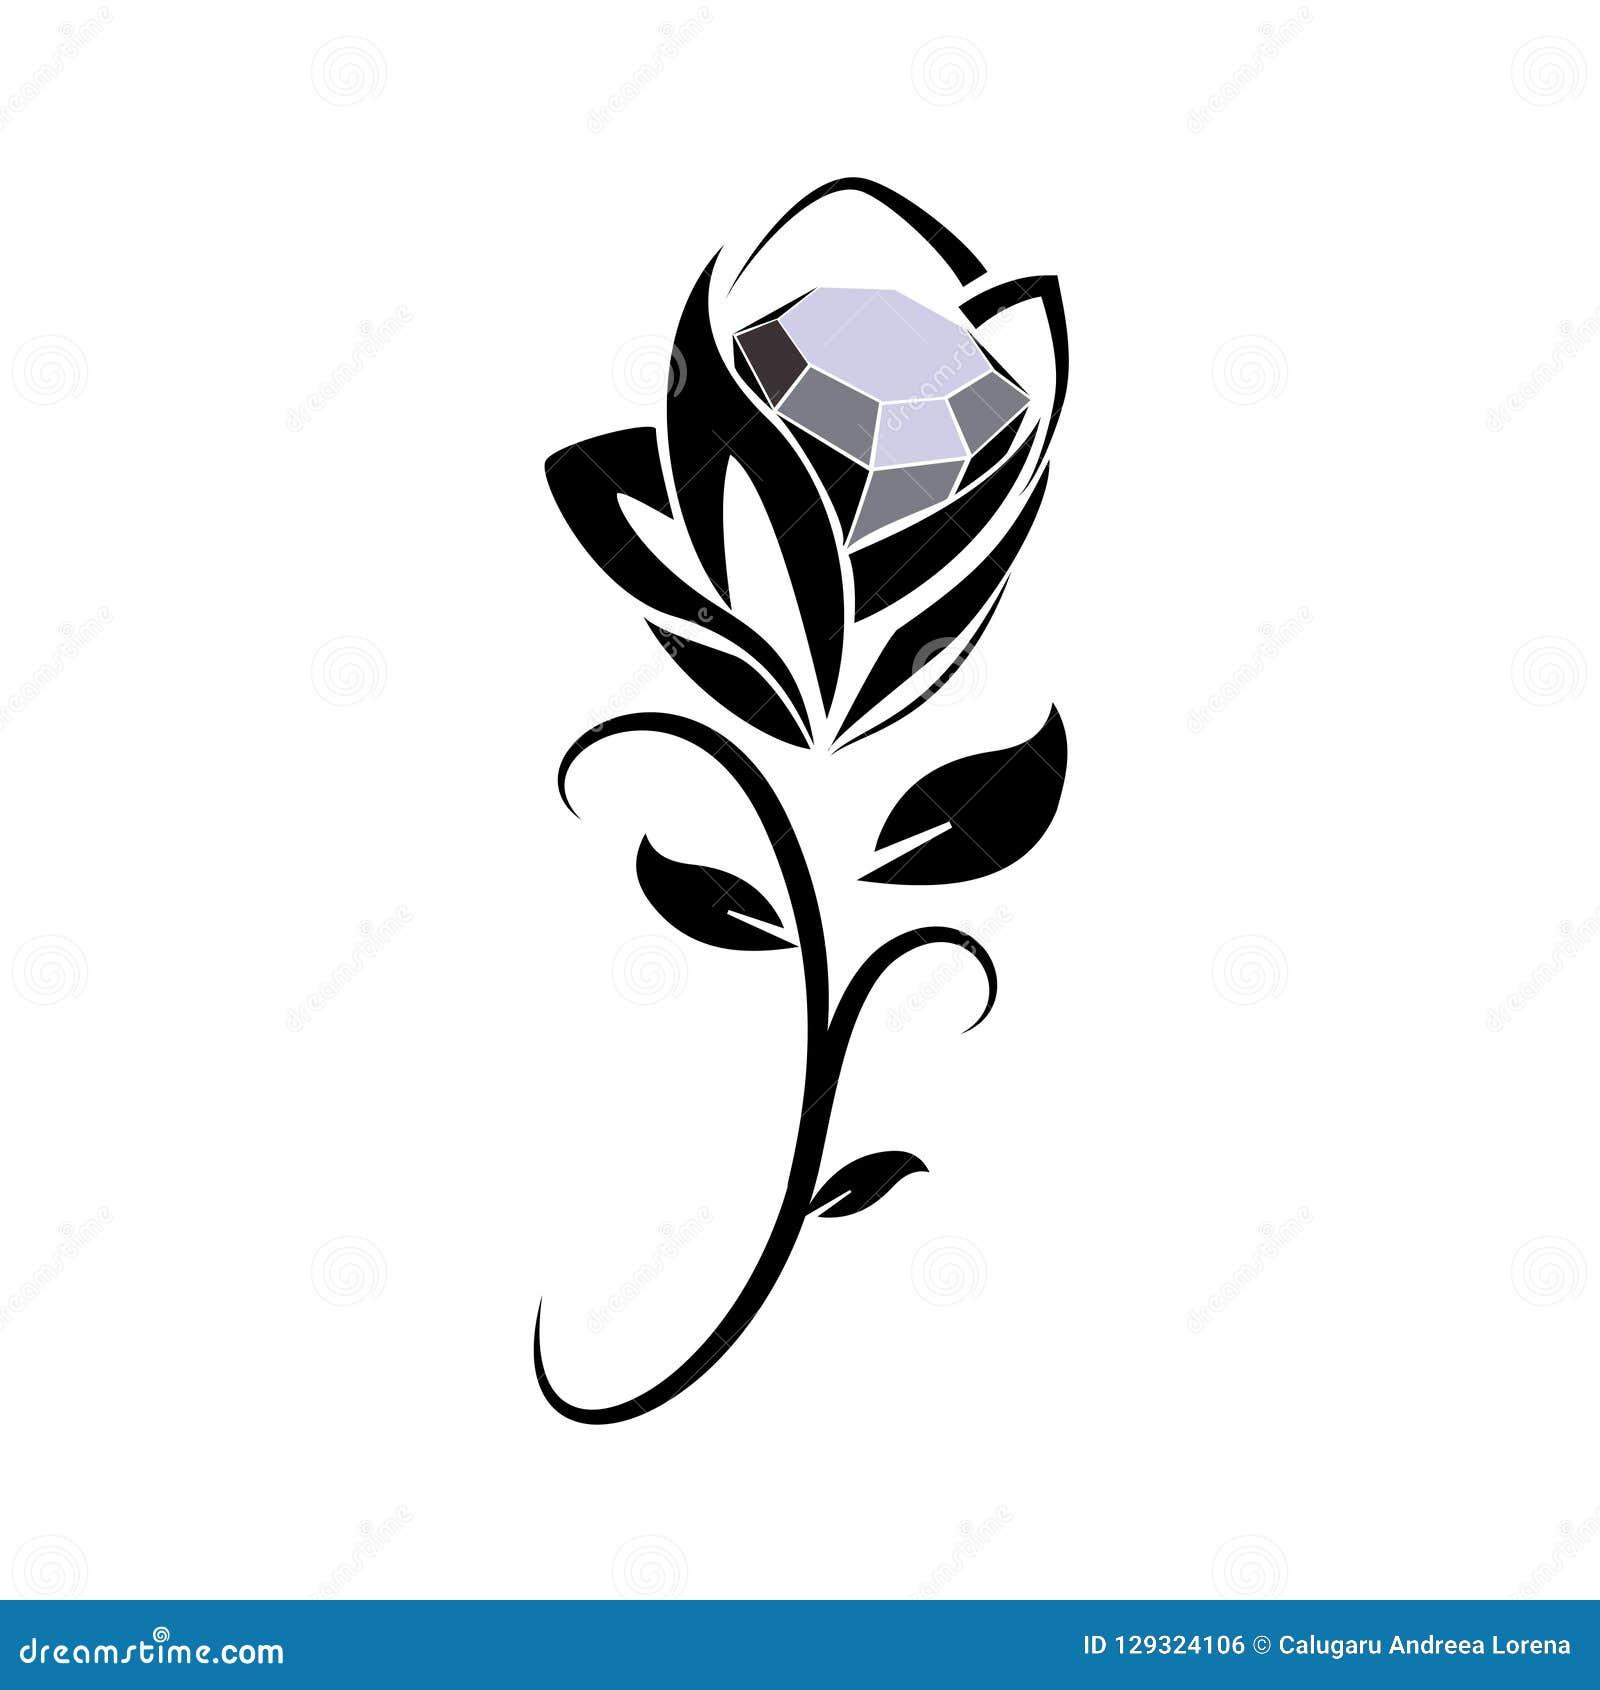 Black diamond rose icon stock vector. Illustration of